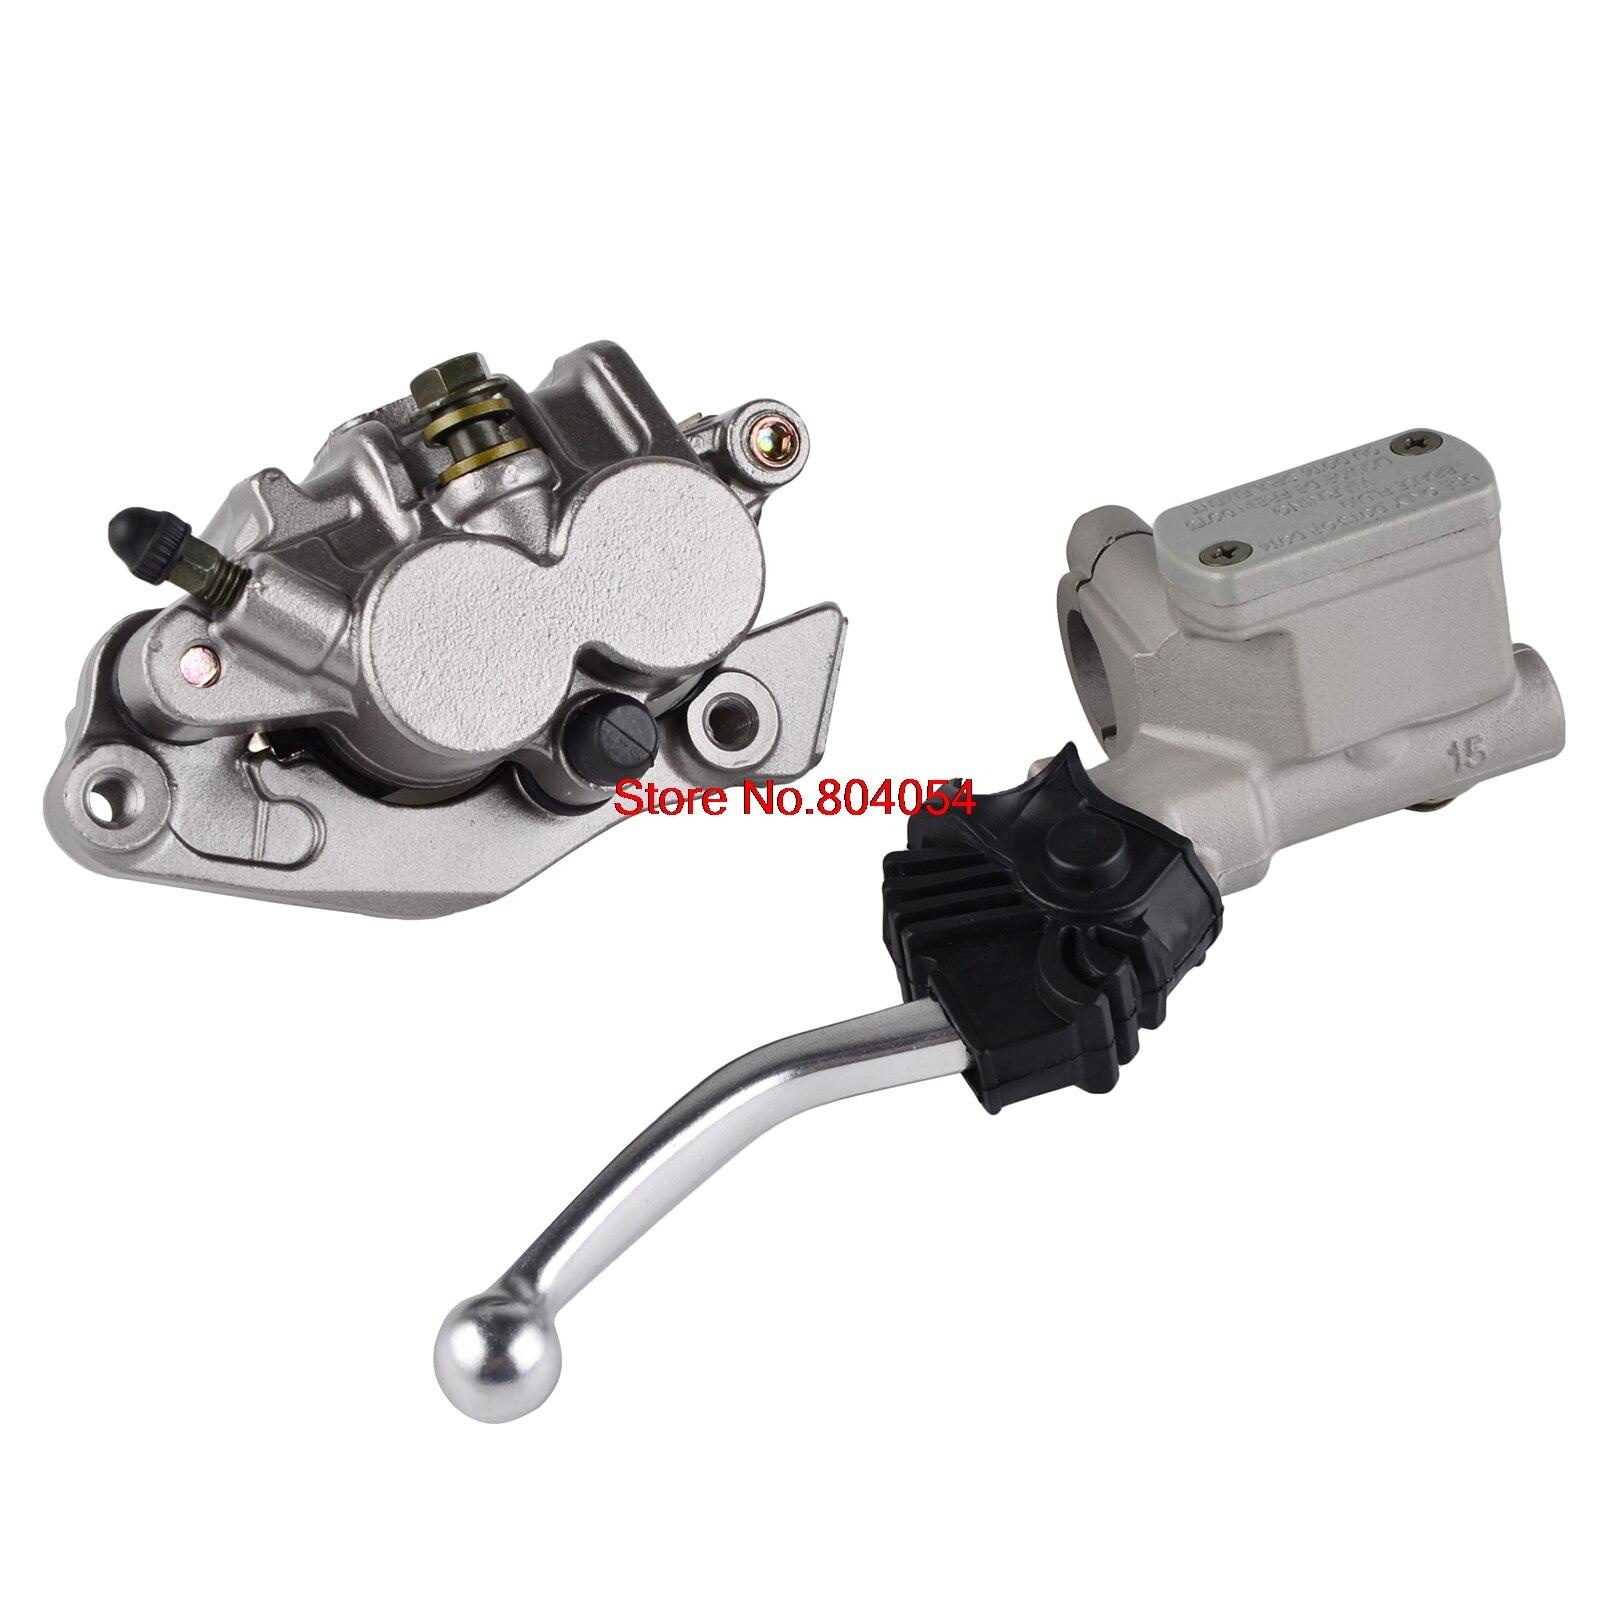 Front Master Cylinder Lever Brake Caliper Pads For Honda CR125R CR250R CRF150F CRF230F CRF250R CRF250X CRF450R